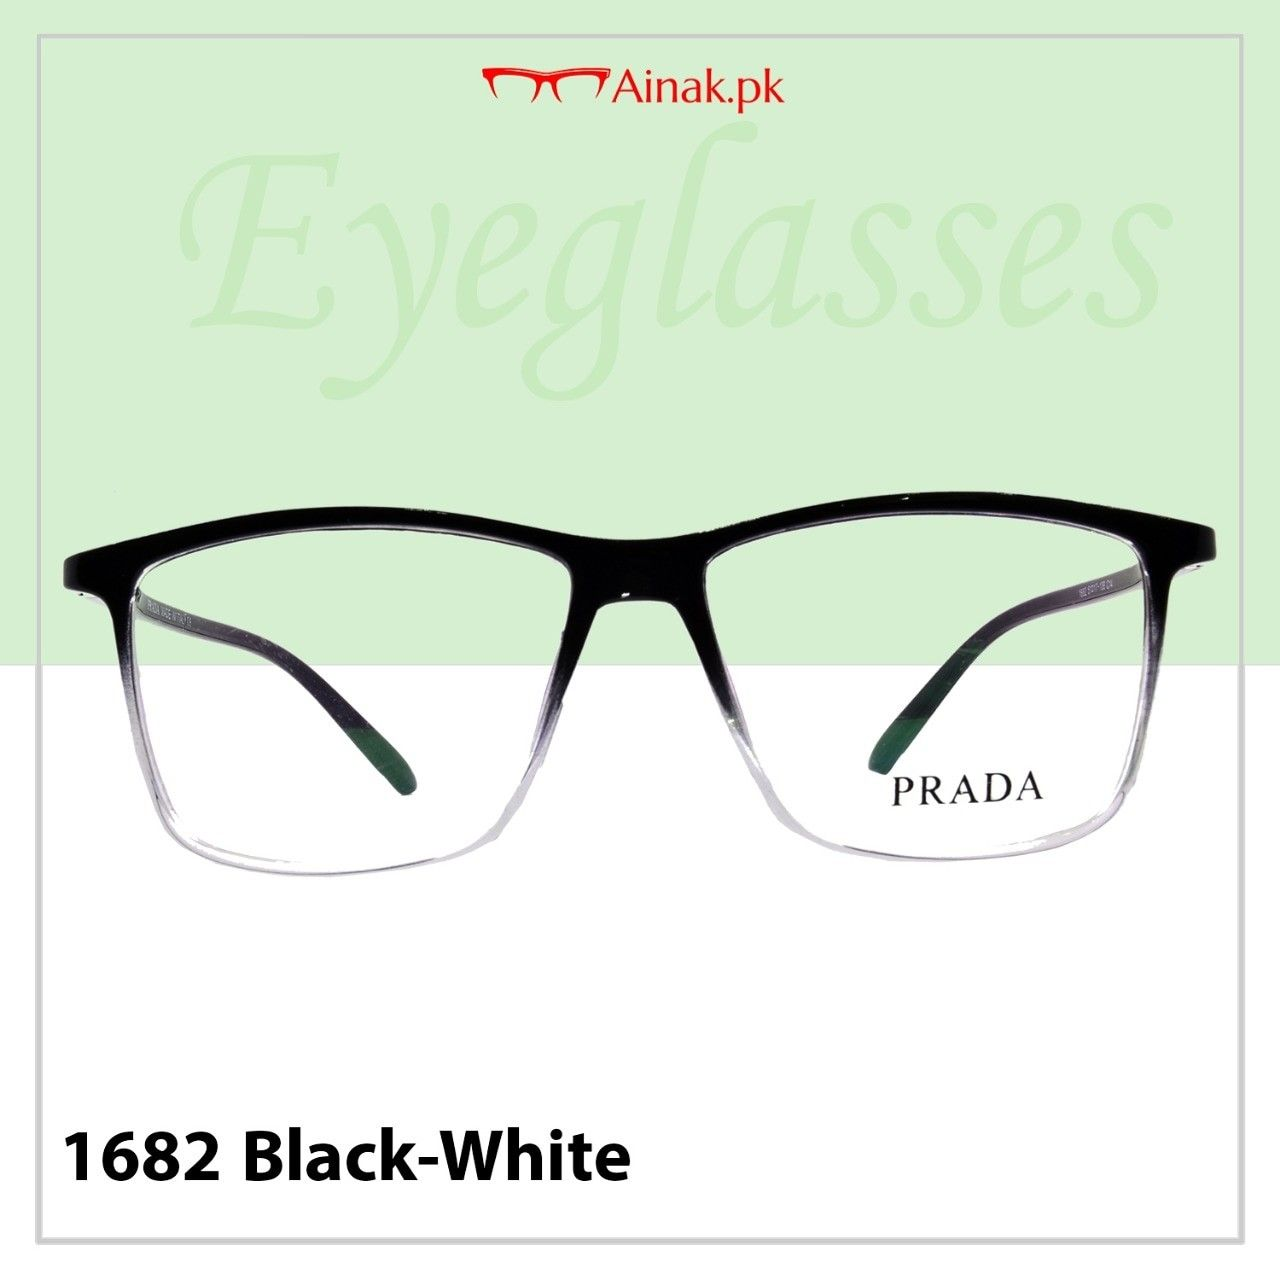 059fb27c04 The best eyewear under the best price. Enjoy shopping at our online store  www.ainak.pk eyeglasses  glasses  glassesframes  eyeglasses  eyeglassframes  ...